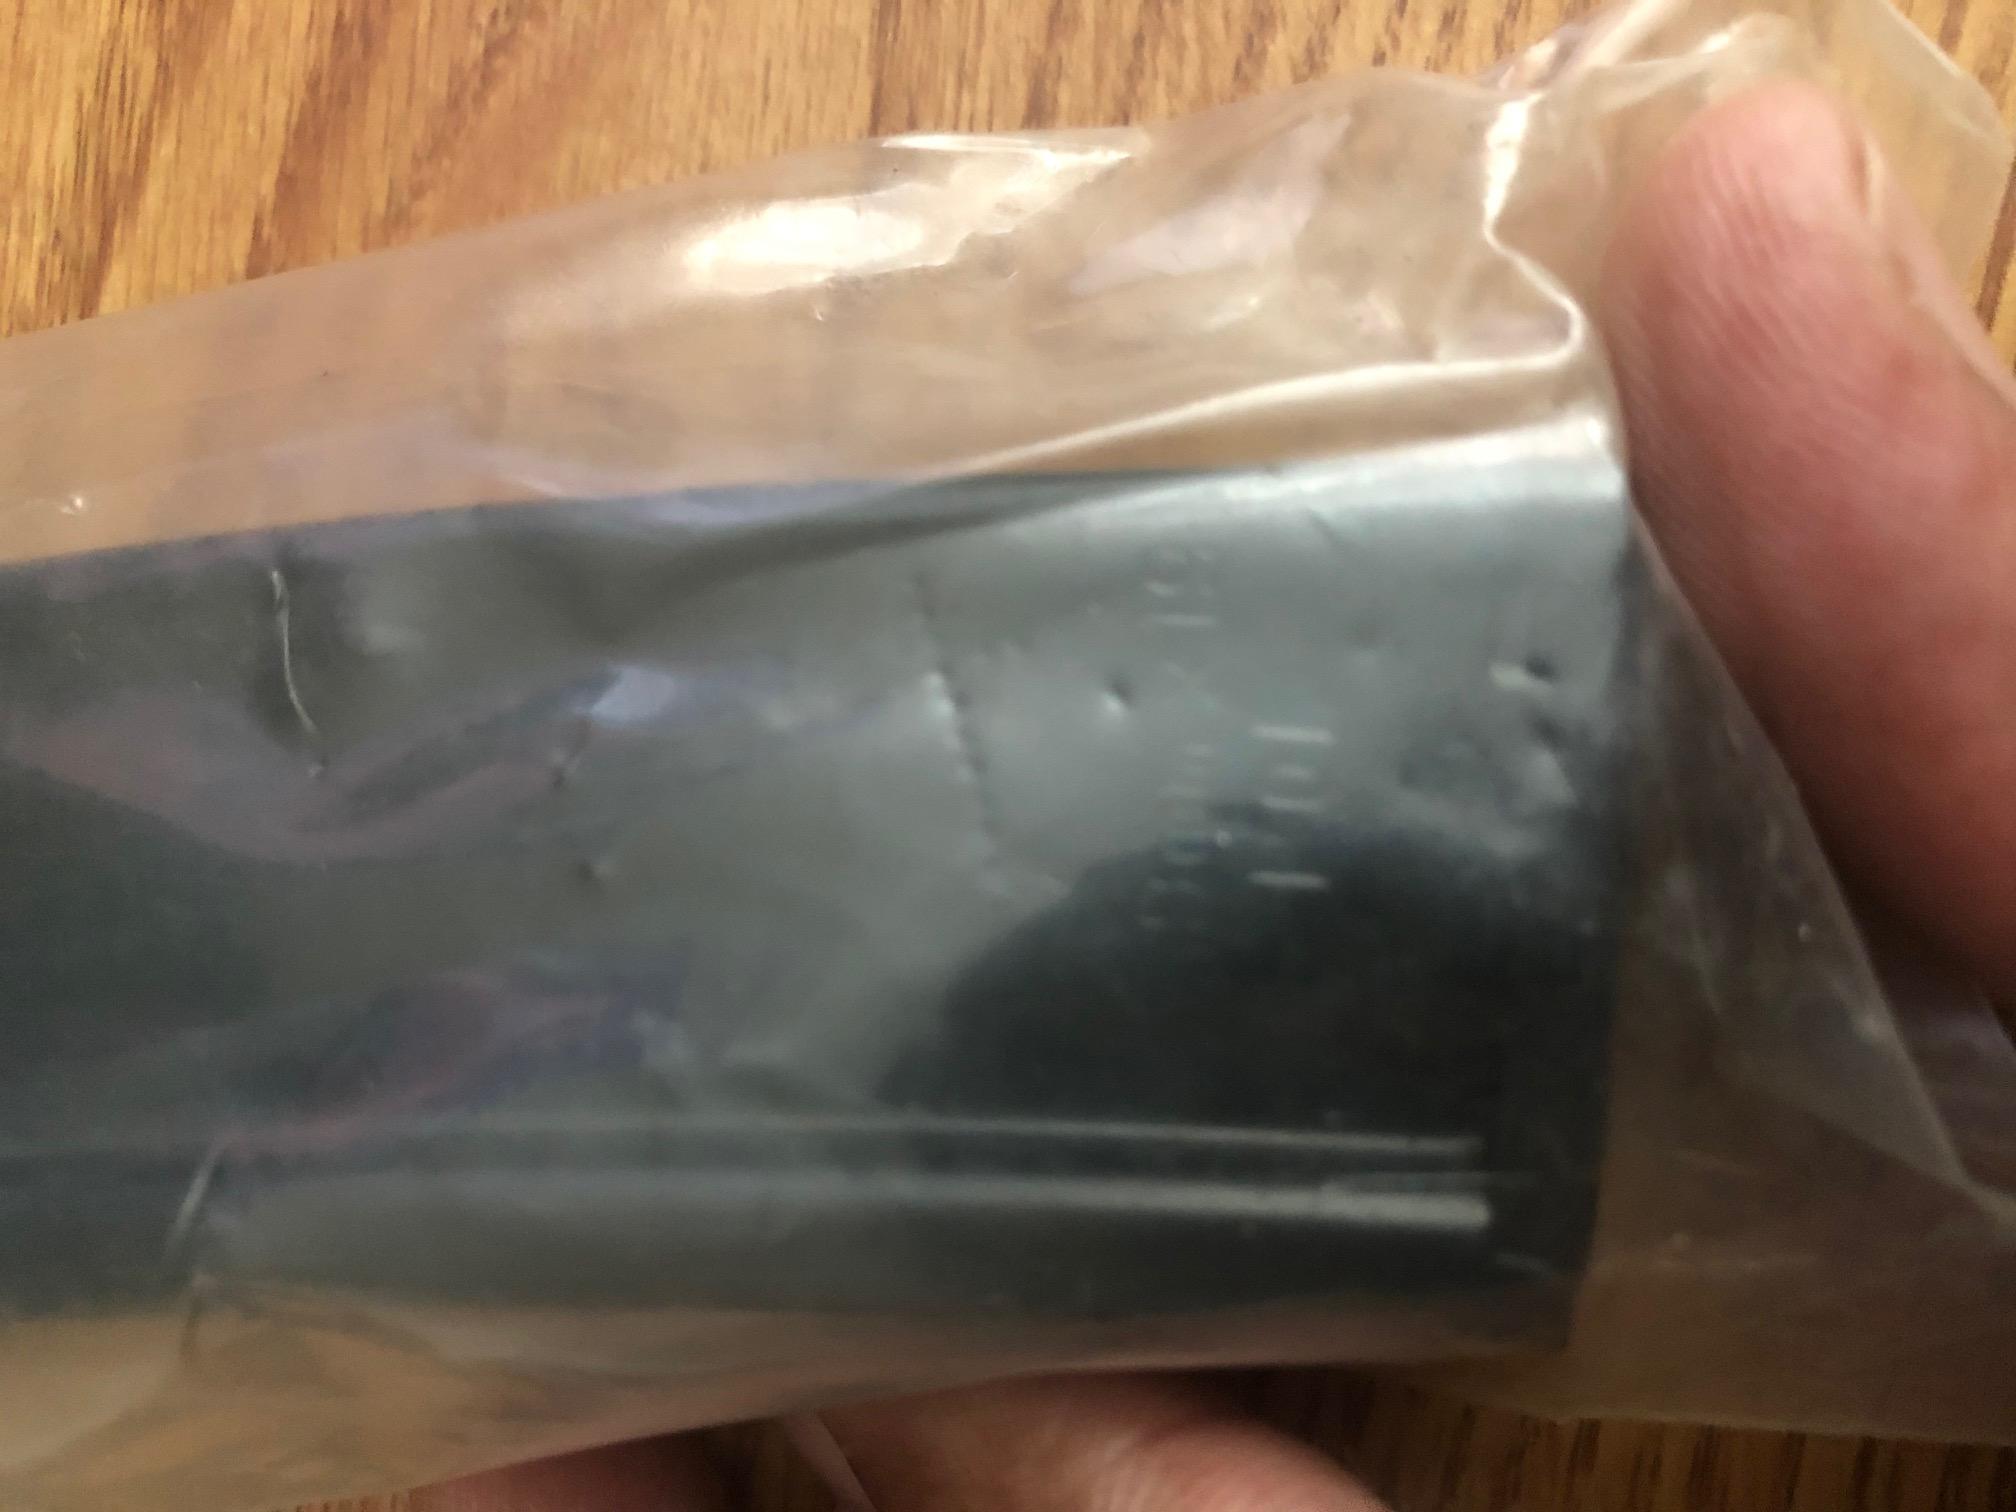 WTS: MP5 mags, one POF niw-img_3986.jpg